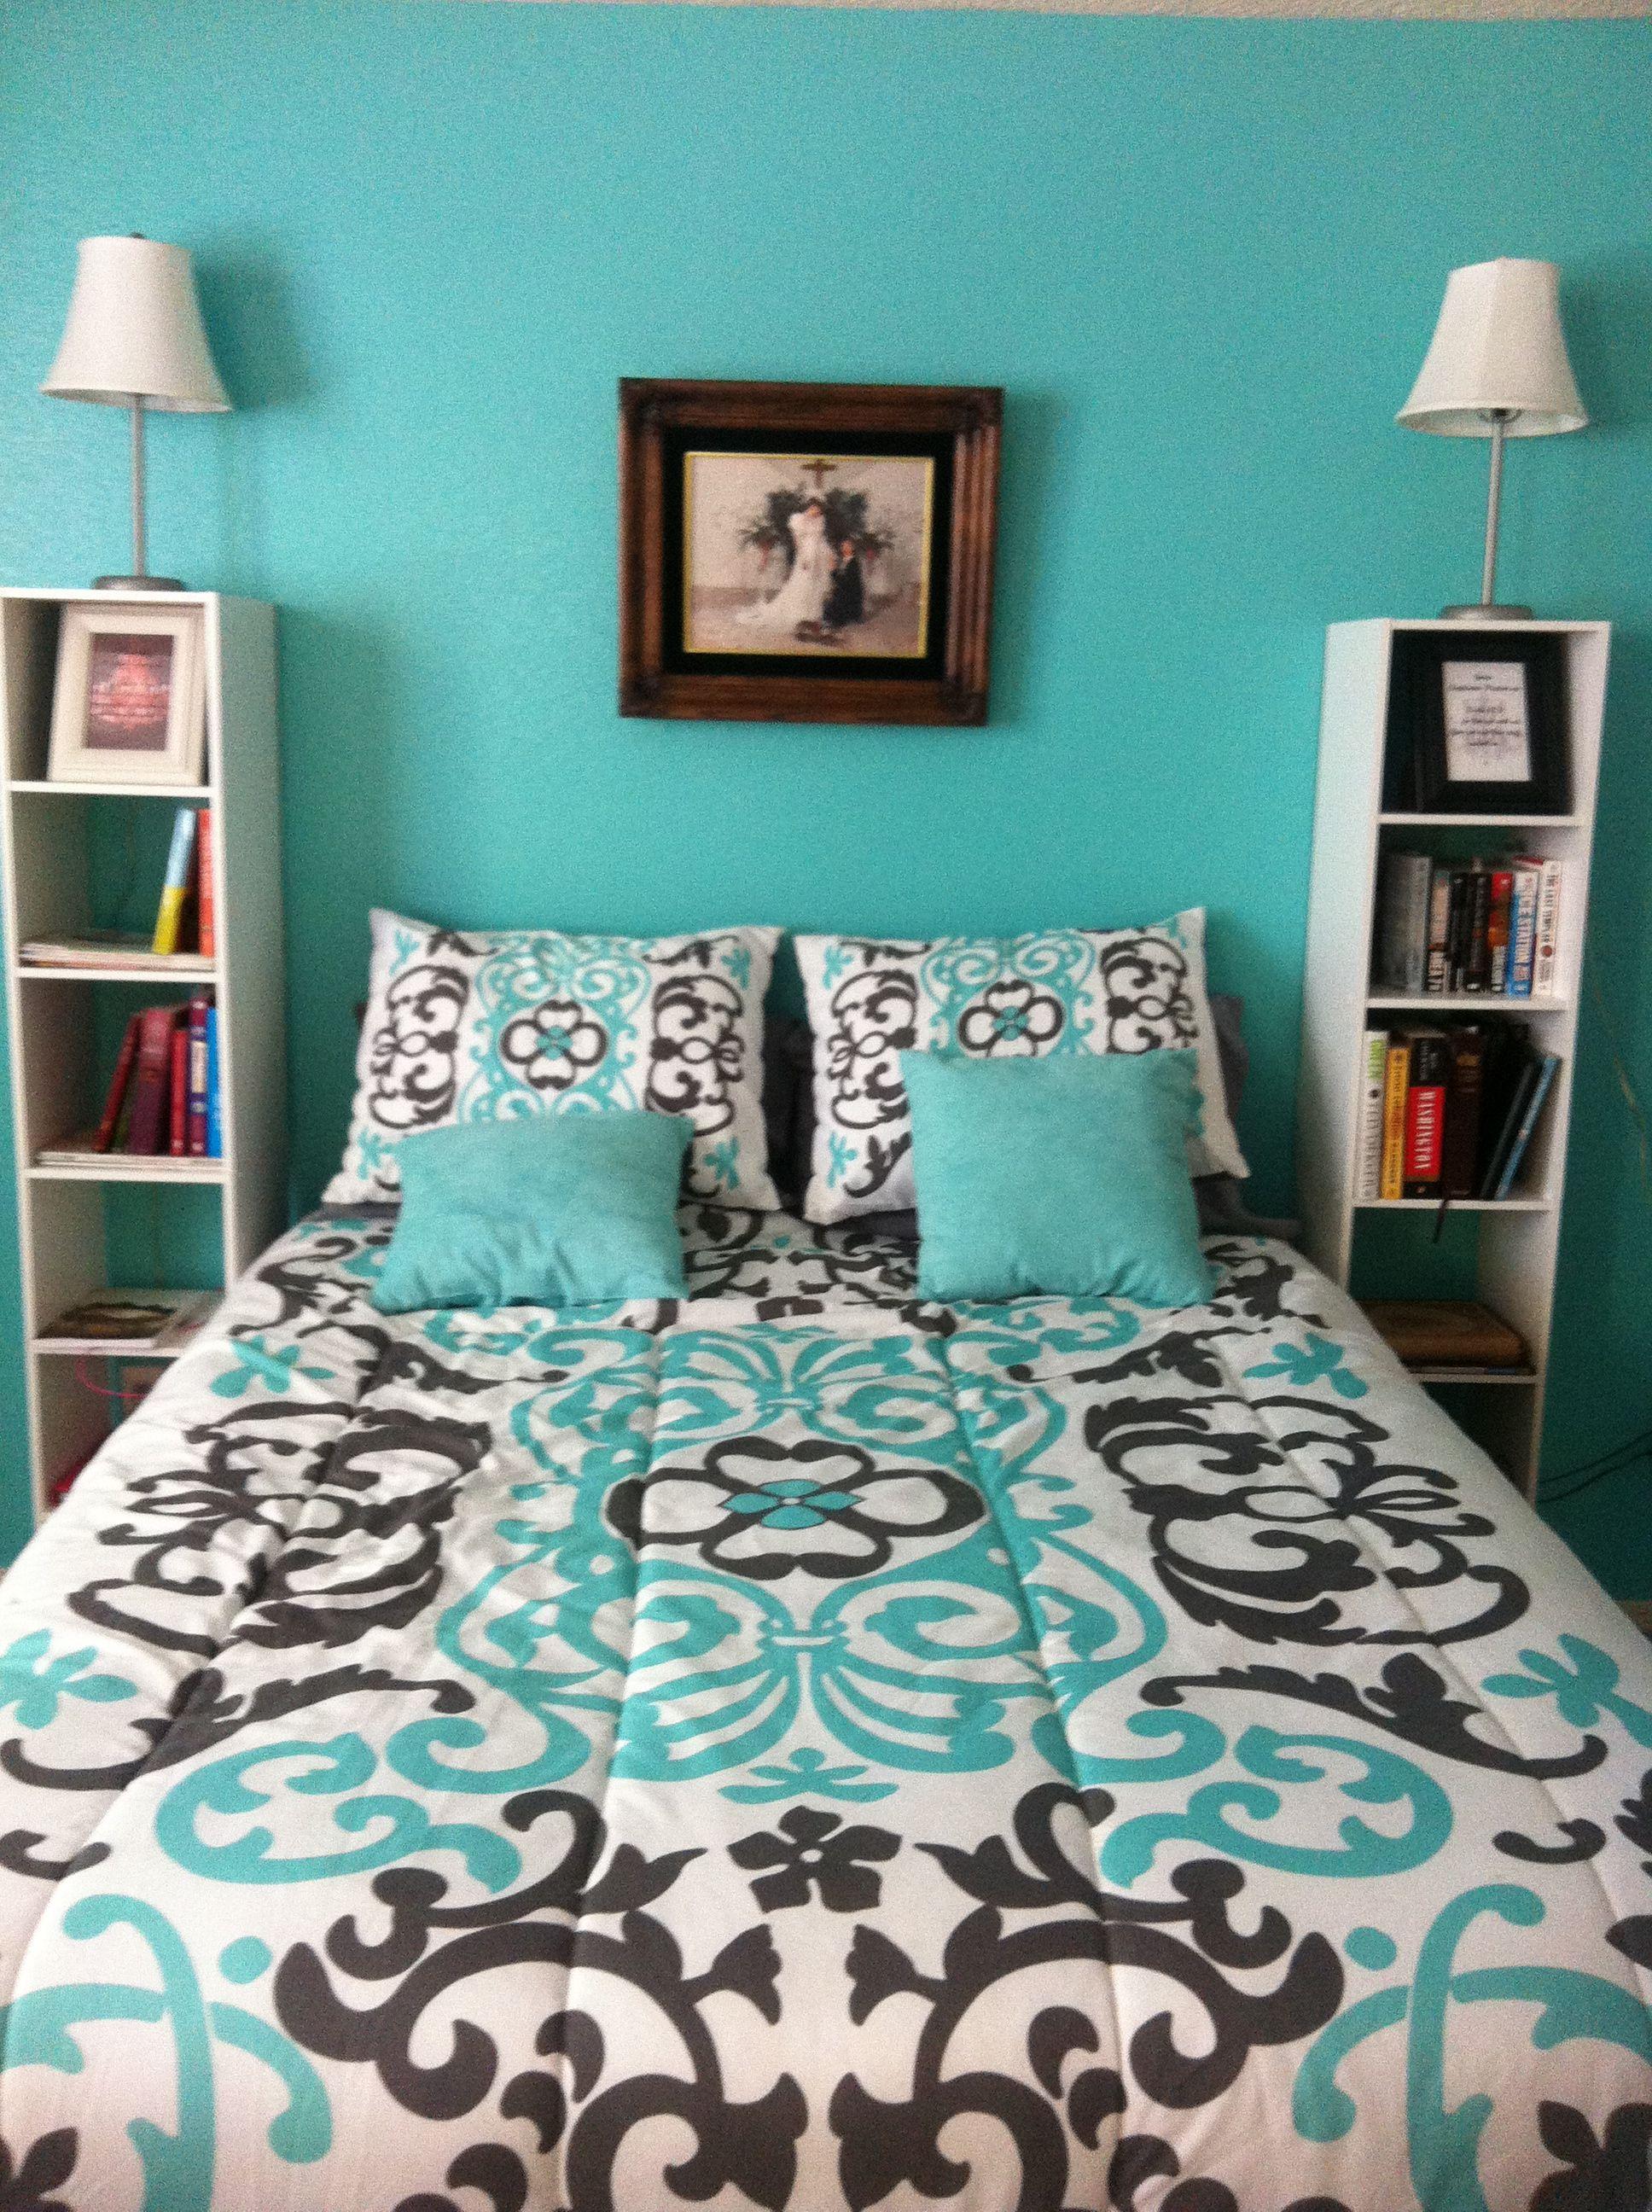 Tiffany blue dark grey and white bedroom room pinterest hogar y estilo for Tiffany blue and grey bedroom